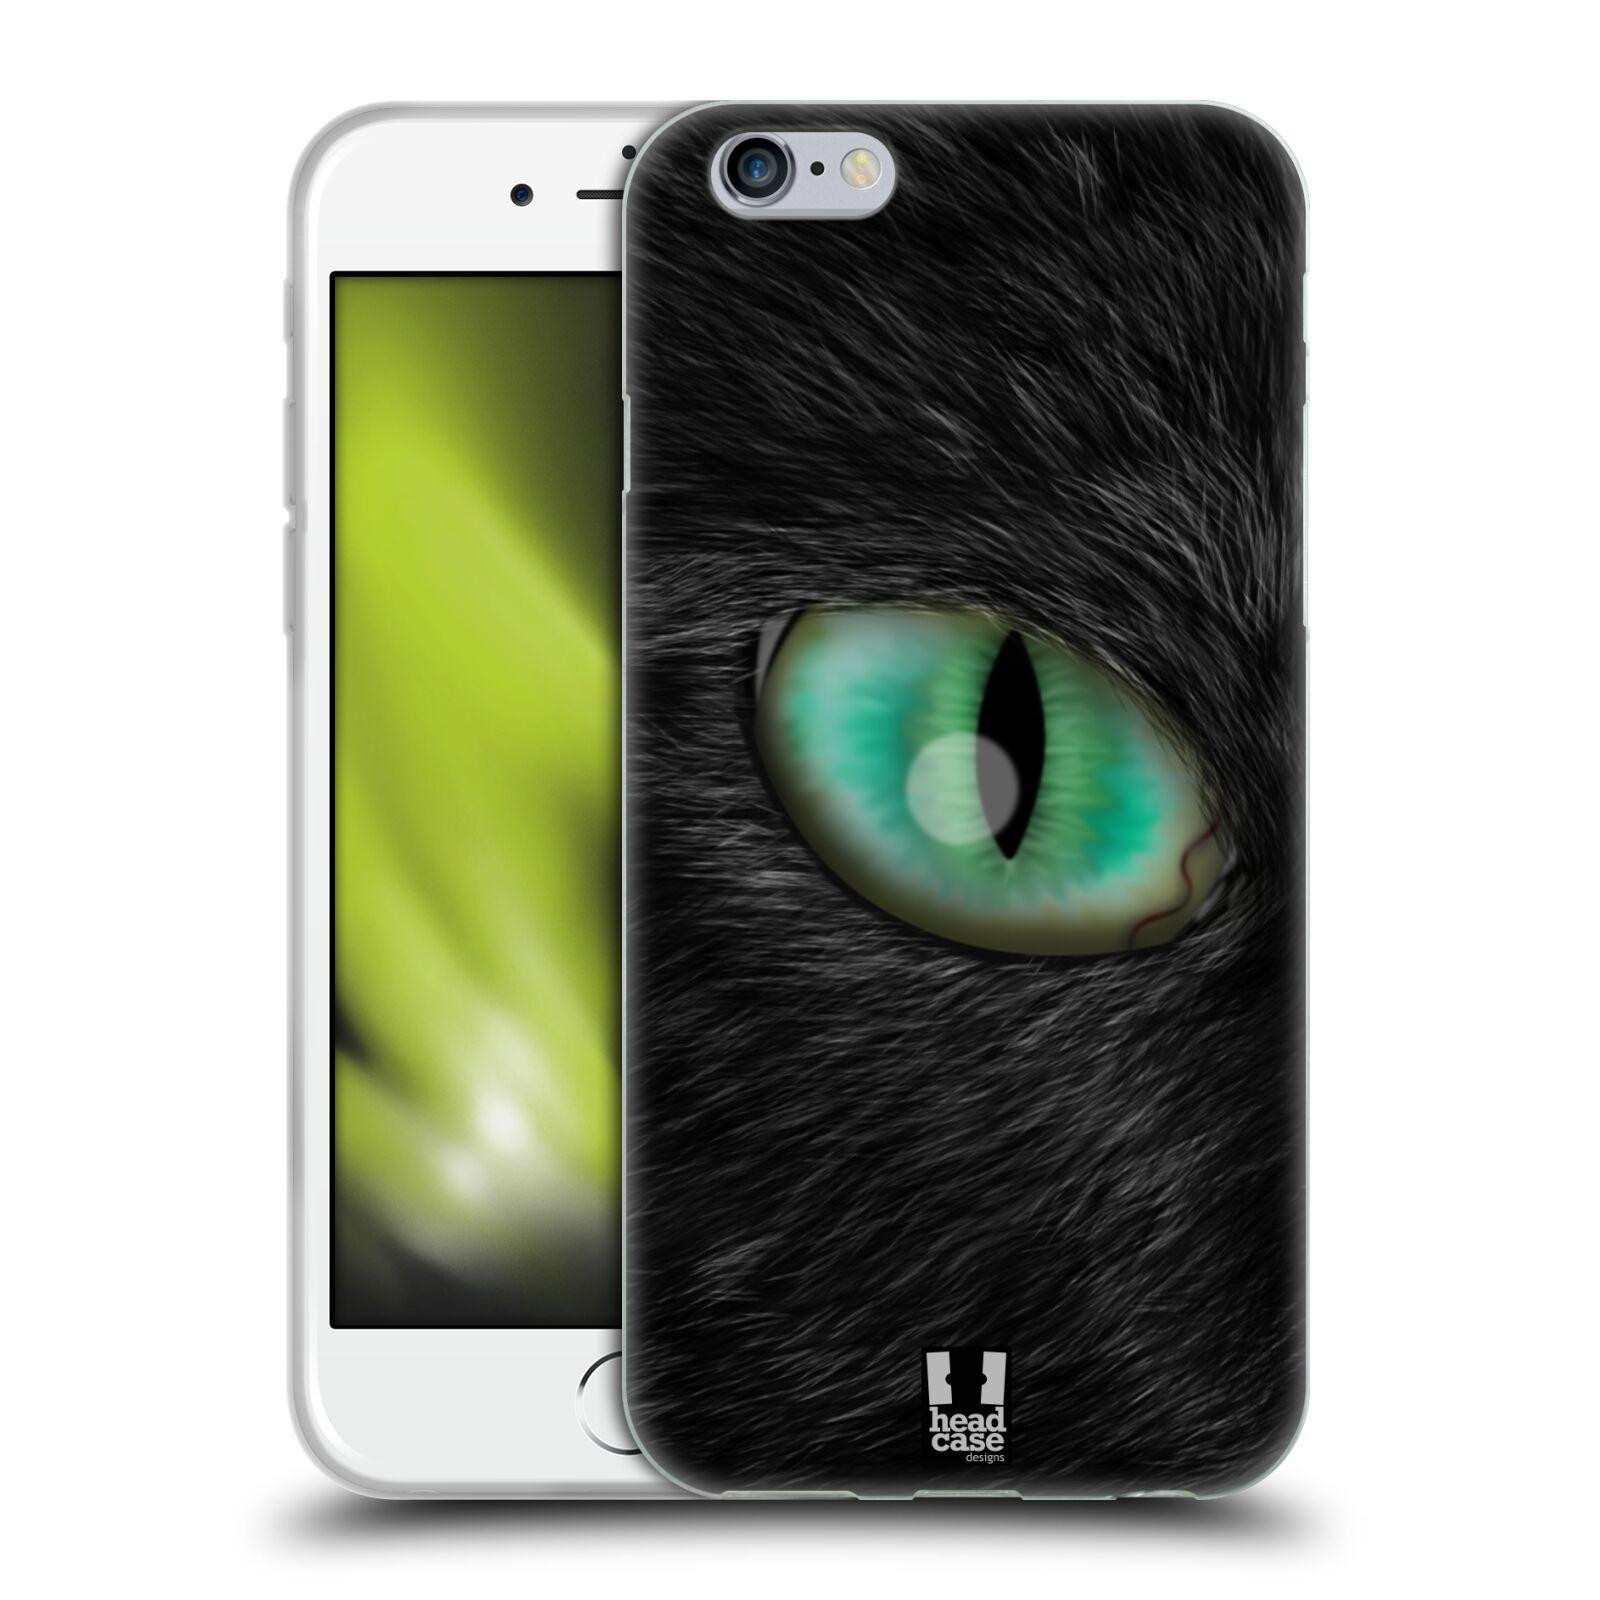 HEAD CASE silikonový obal na mobil Apple Iphone 6/6S vzor pohled zvířete oko kočka